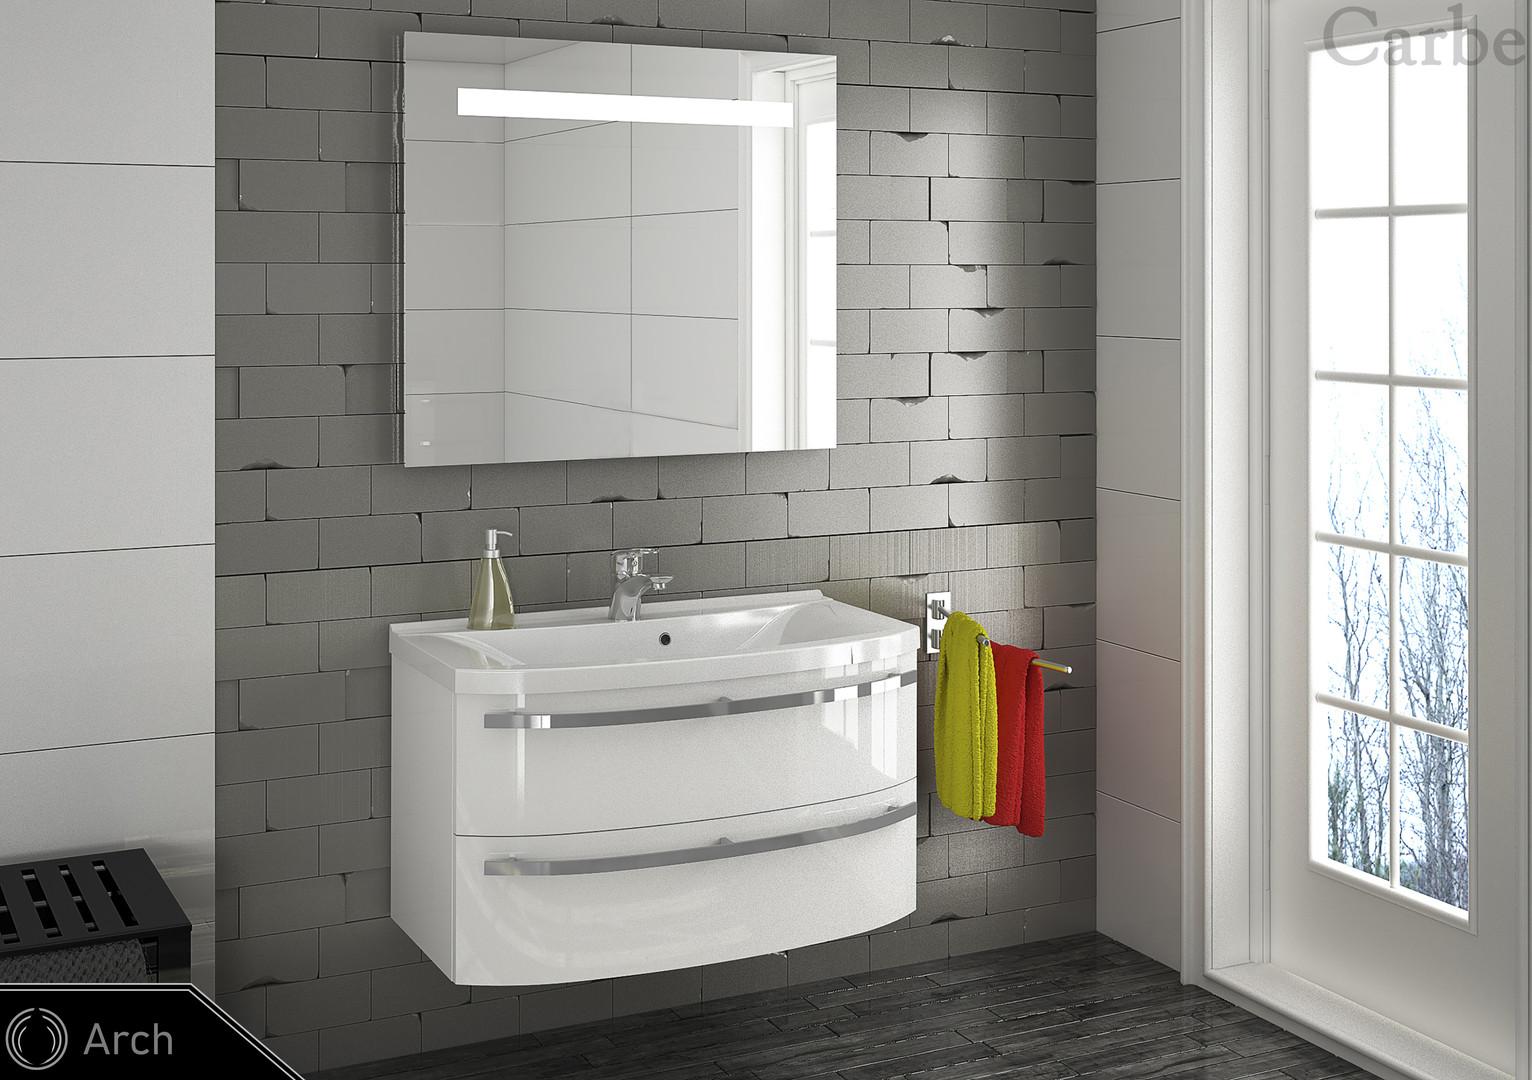 Arch - Artic White High Gloss, Dolmite Washbasin, Soft Closing